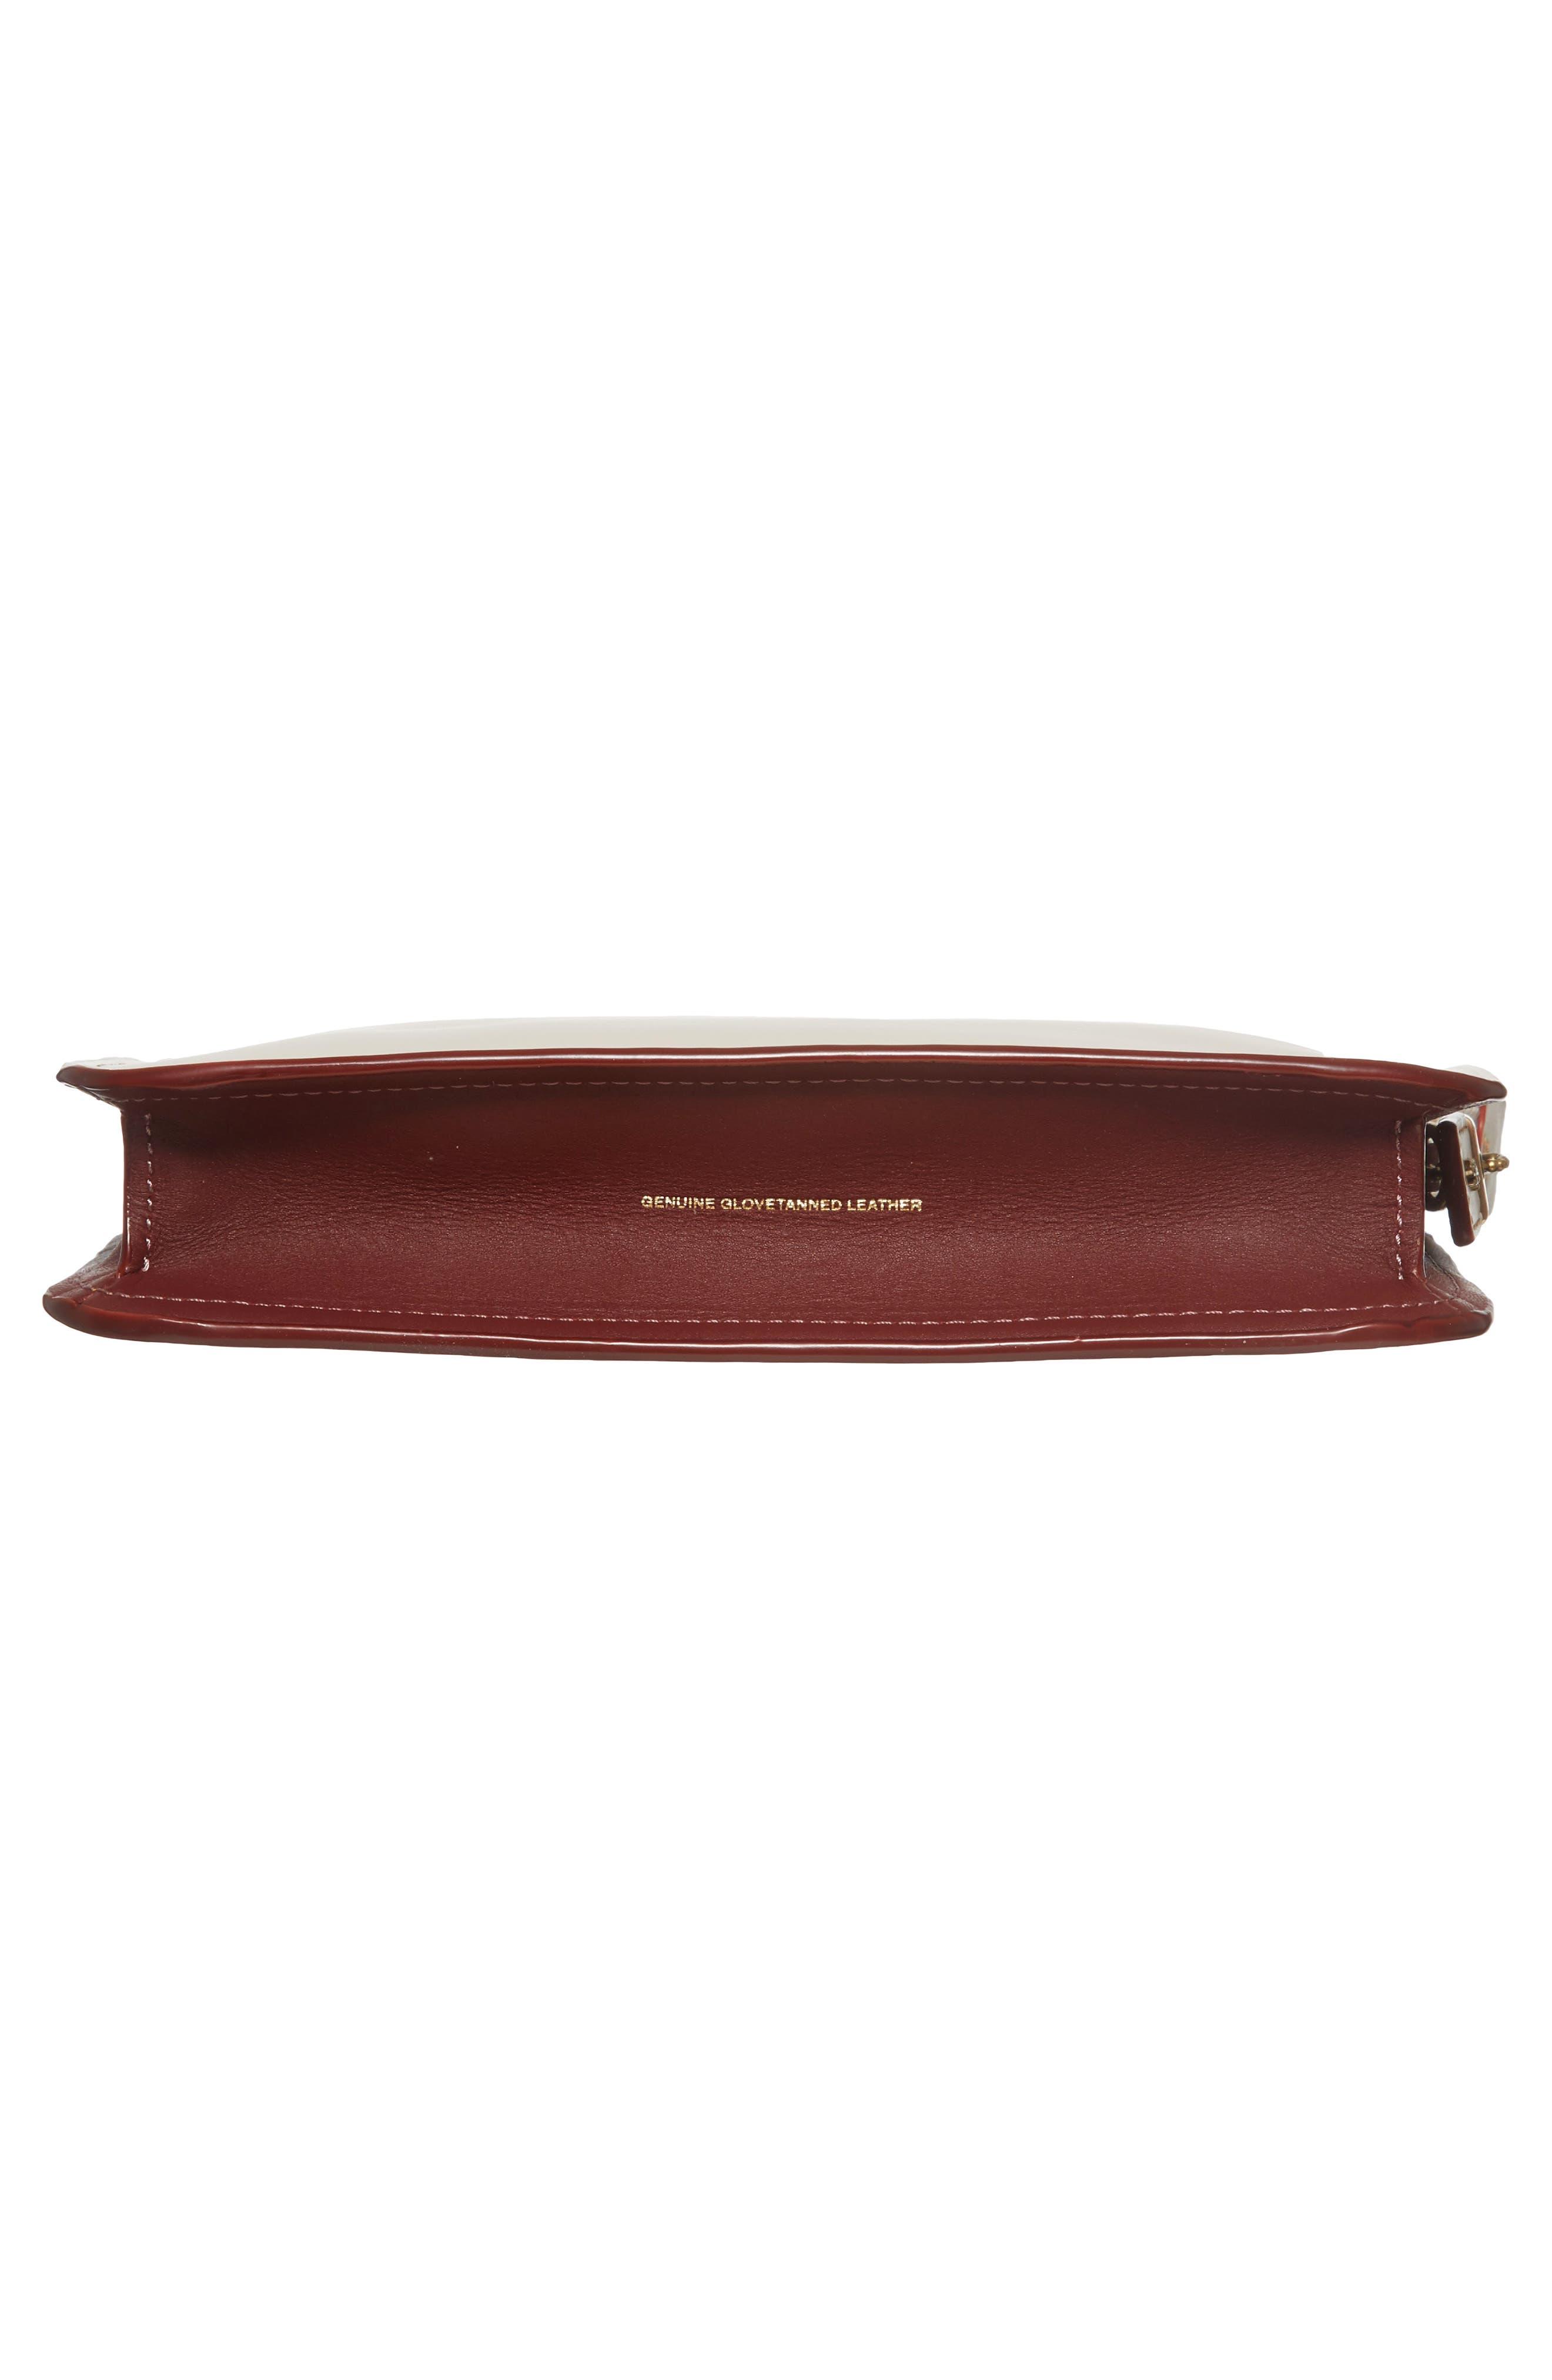 Colorblock Soho Leather Crossbody Bag,                             Alternate thumbnail 6, color,                             250